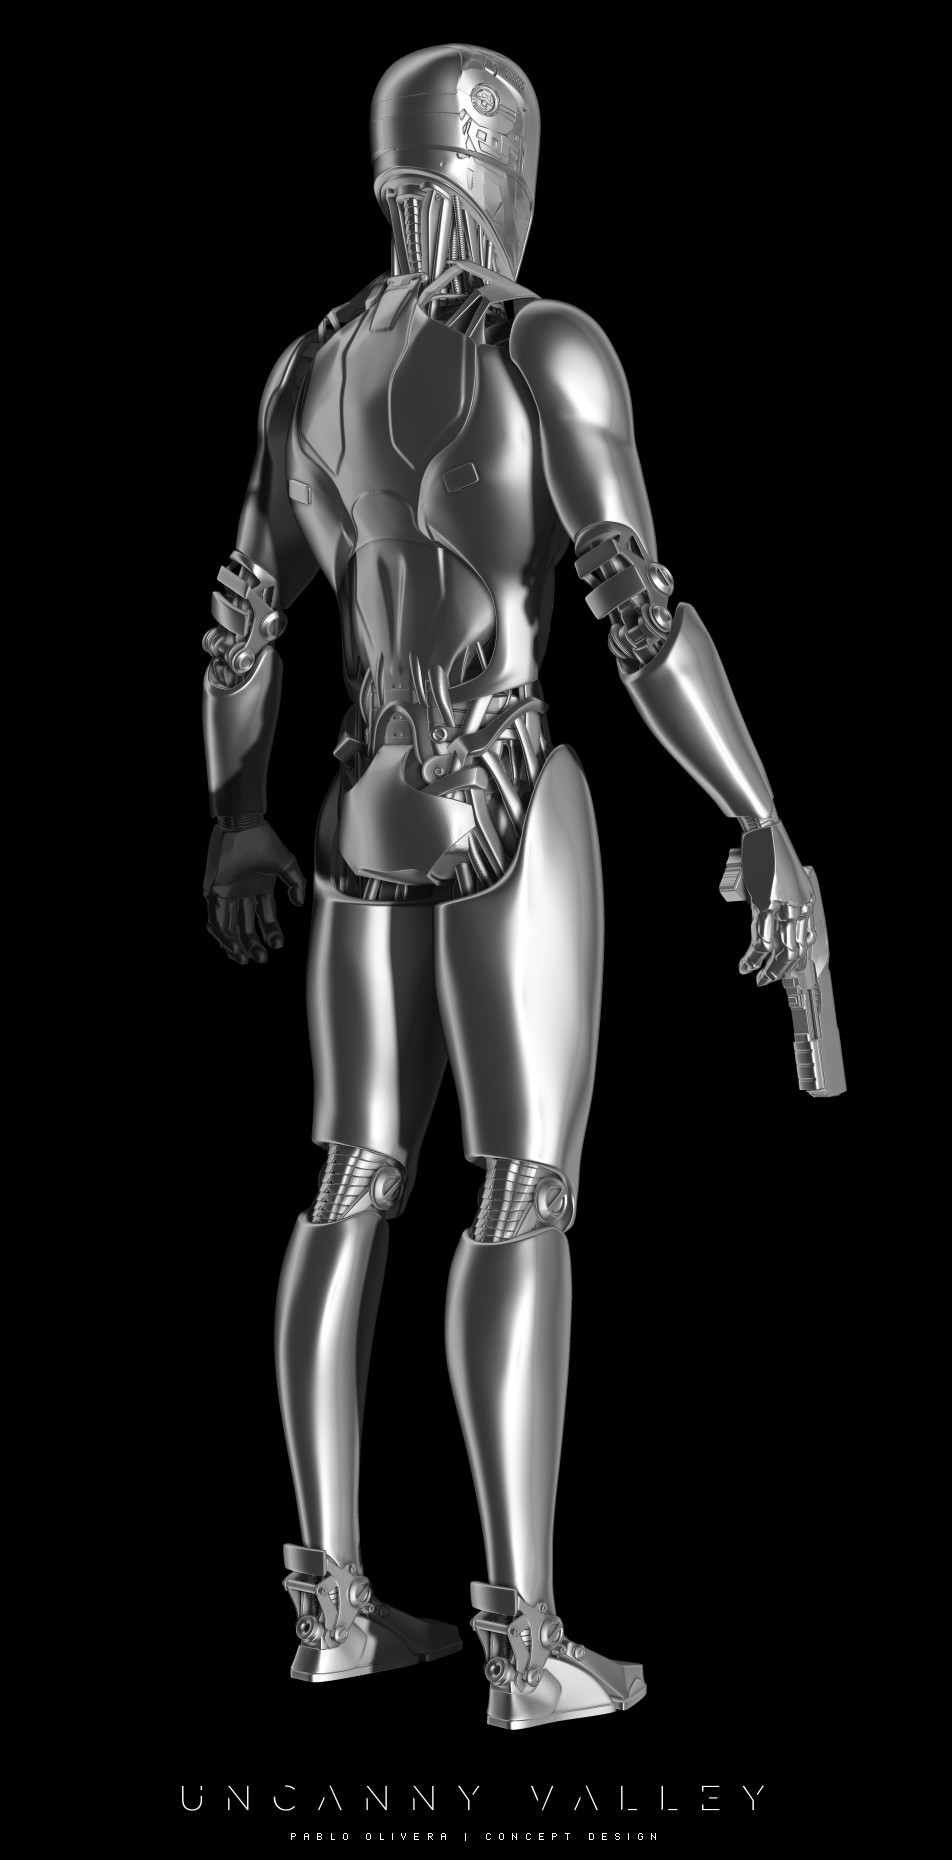 Pablo olivera pablo olivera uncanny valley character design robot 04